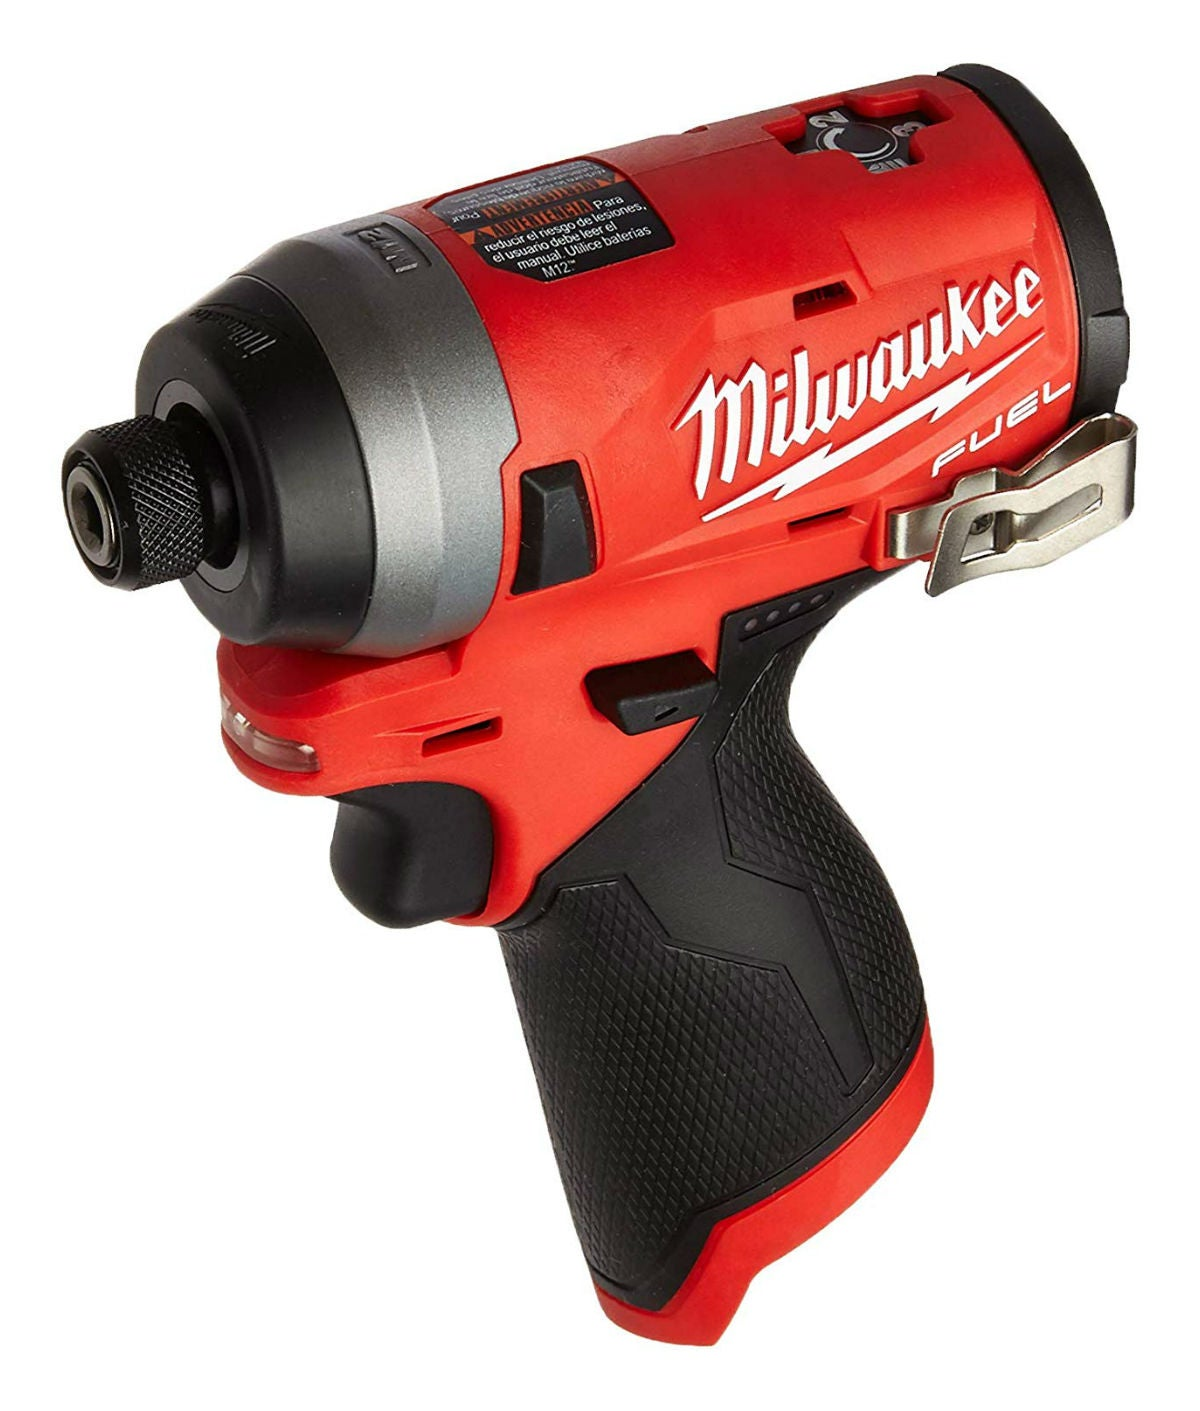 Best Impact Driver Options: Milwaukee M12 12-V Impact Driver